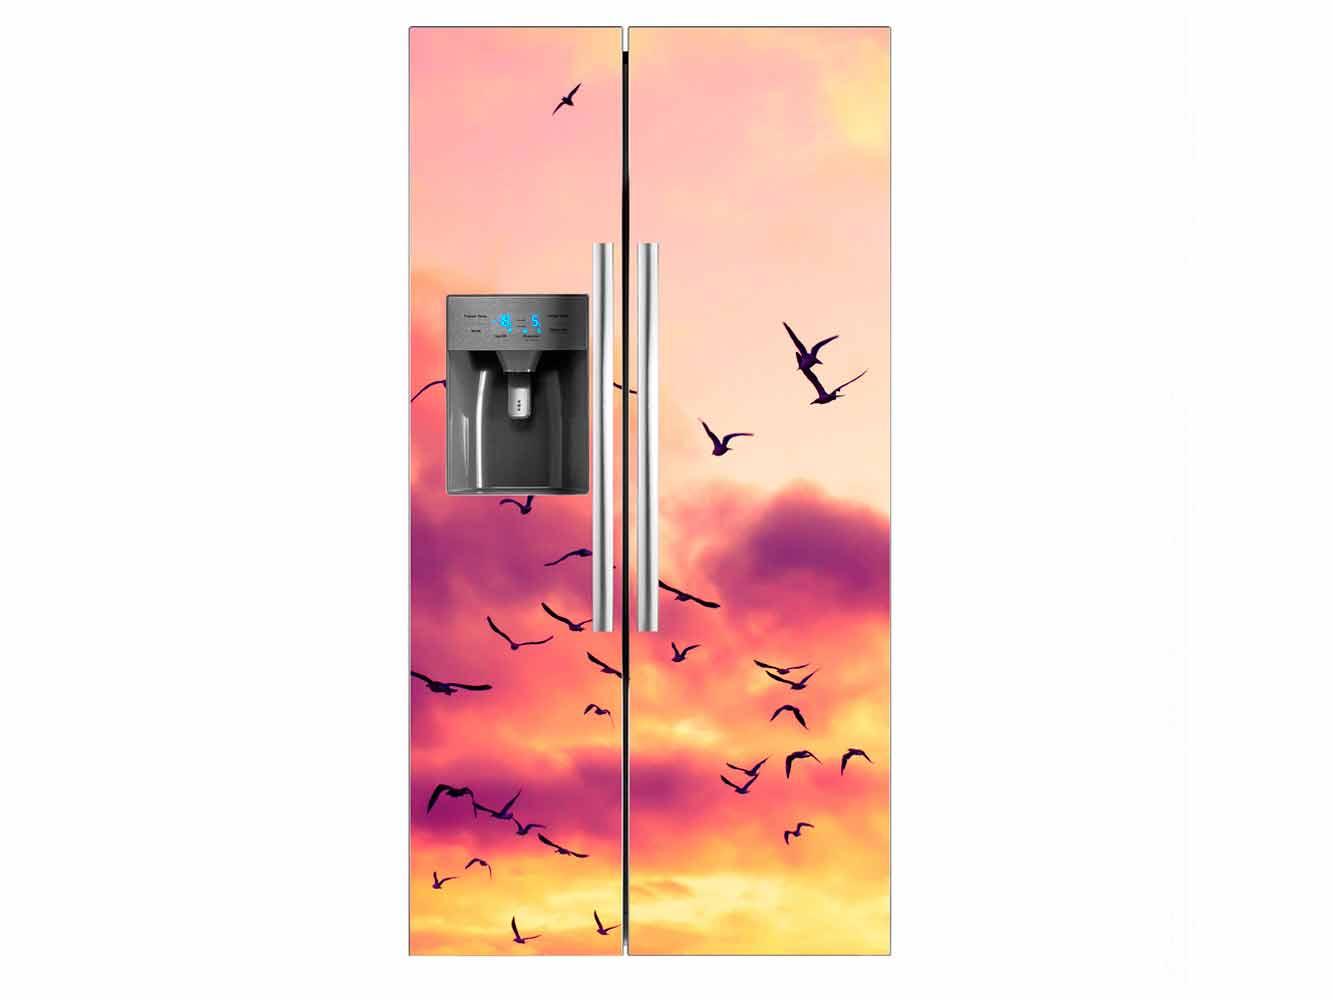 Vinilo Frigorífico Americano Pájaros Volando | Carteles XXL - Impresión carteleria publicitaria